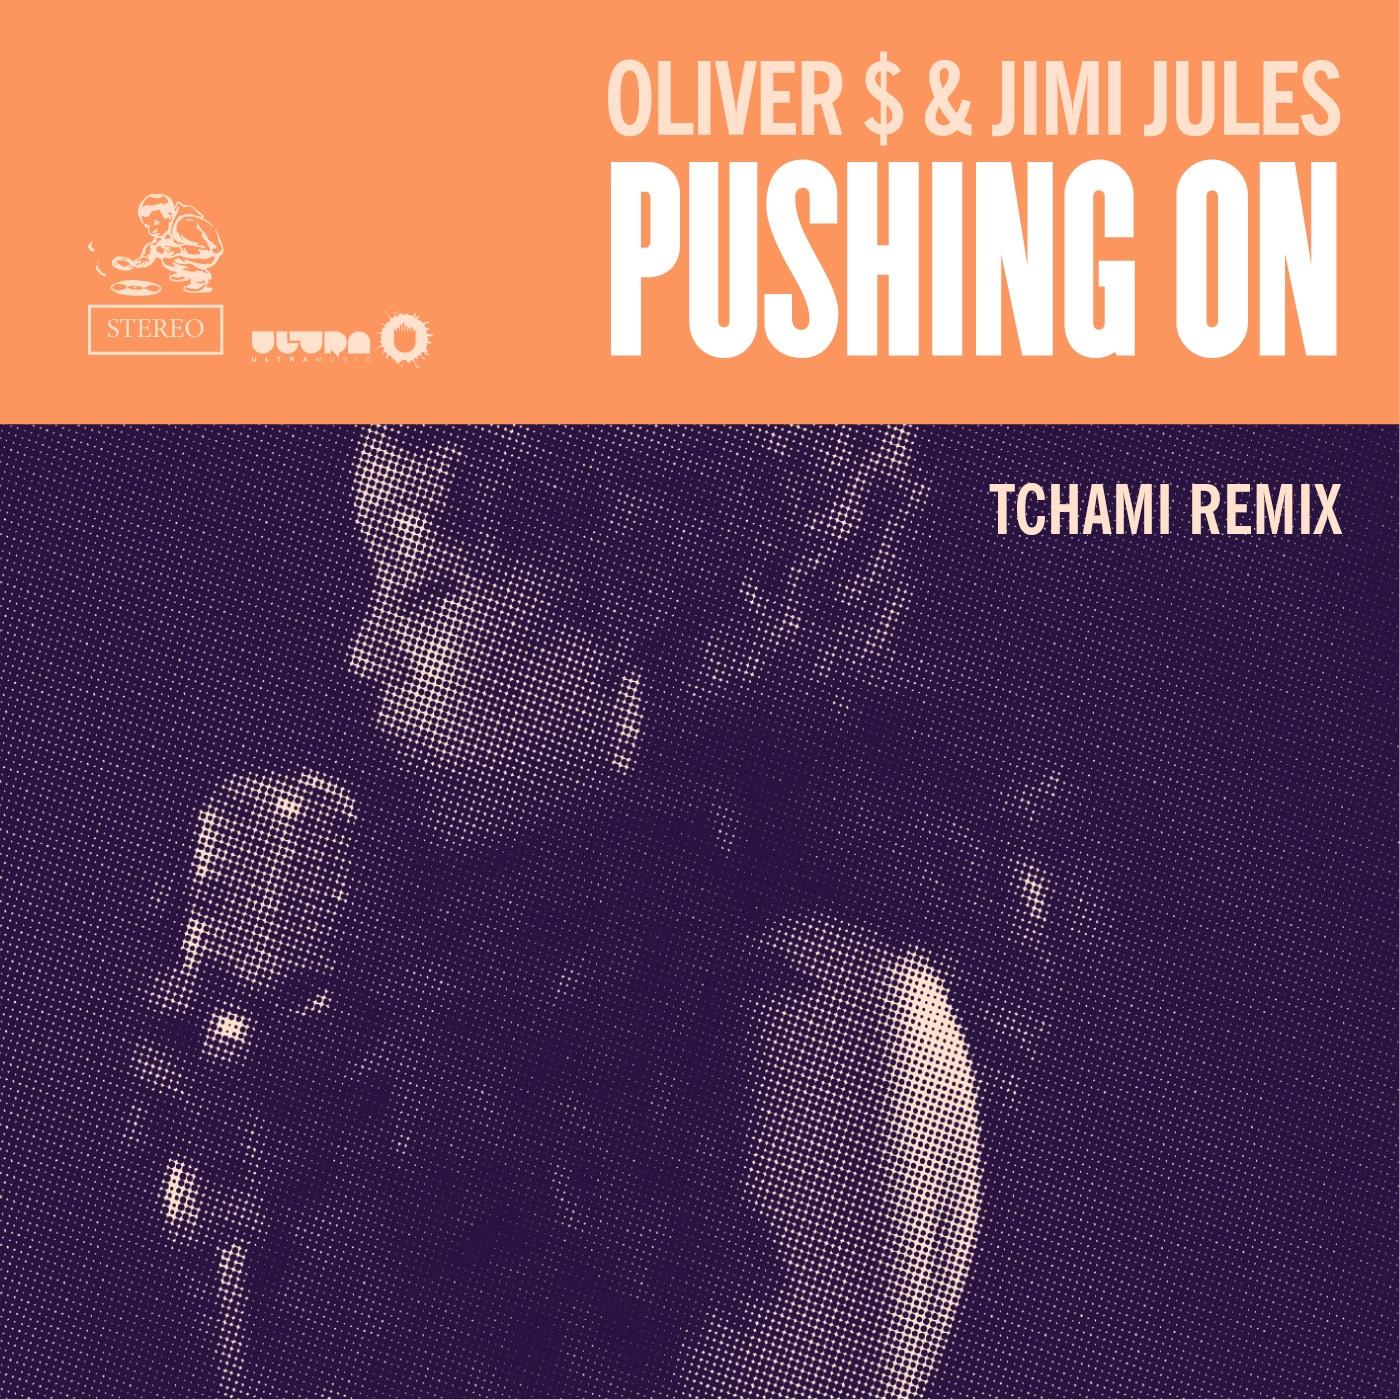 Pushing On (Tchami Remix) - Single